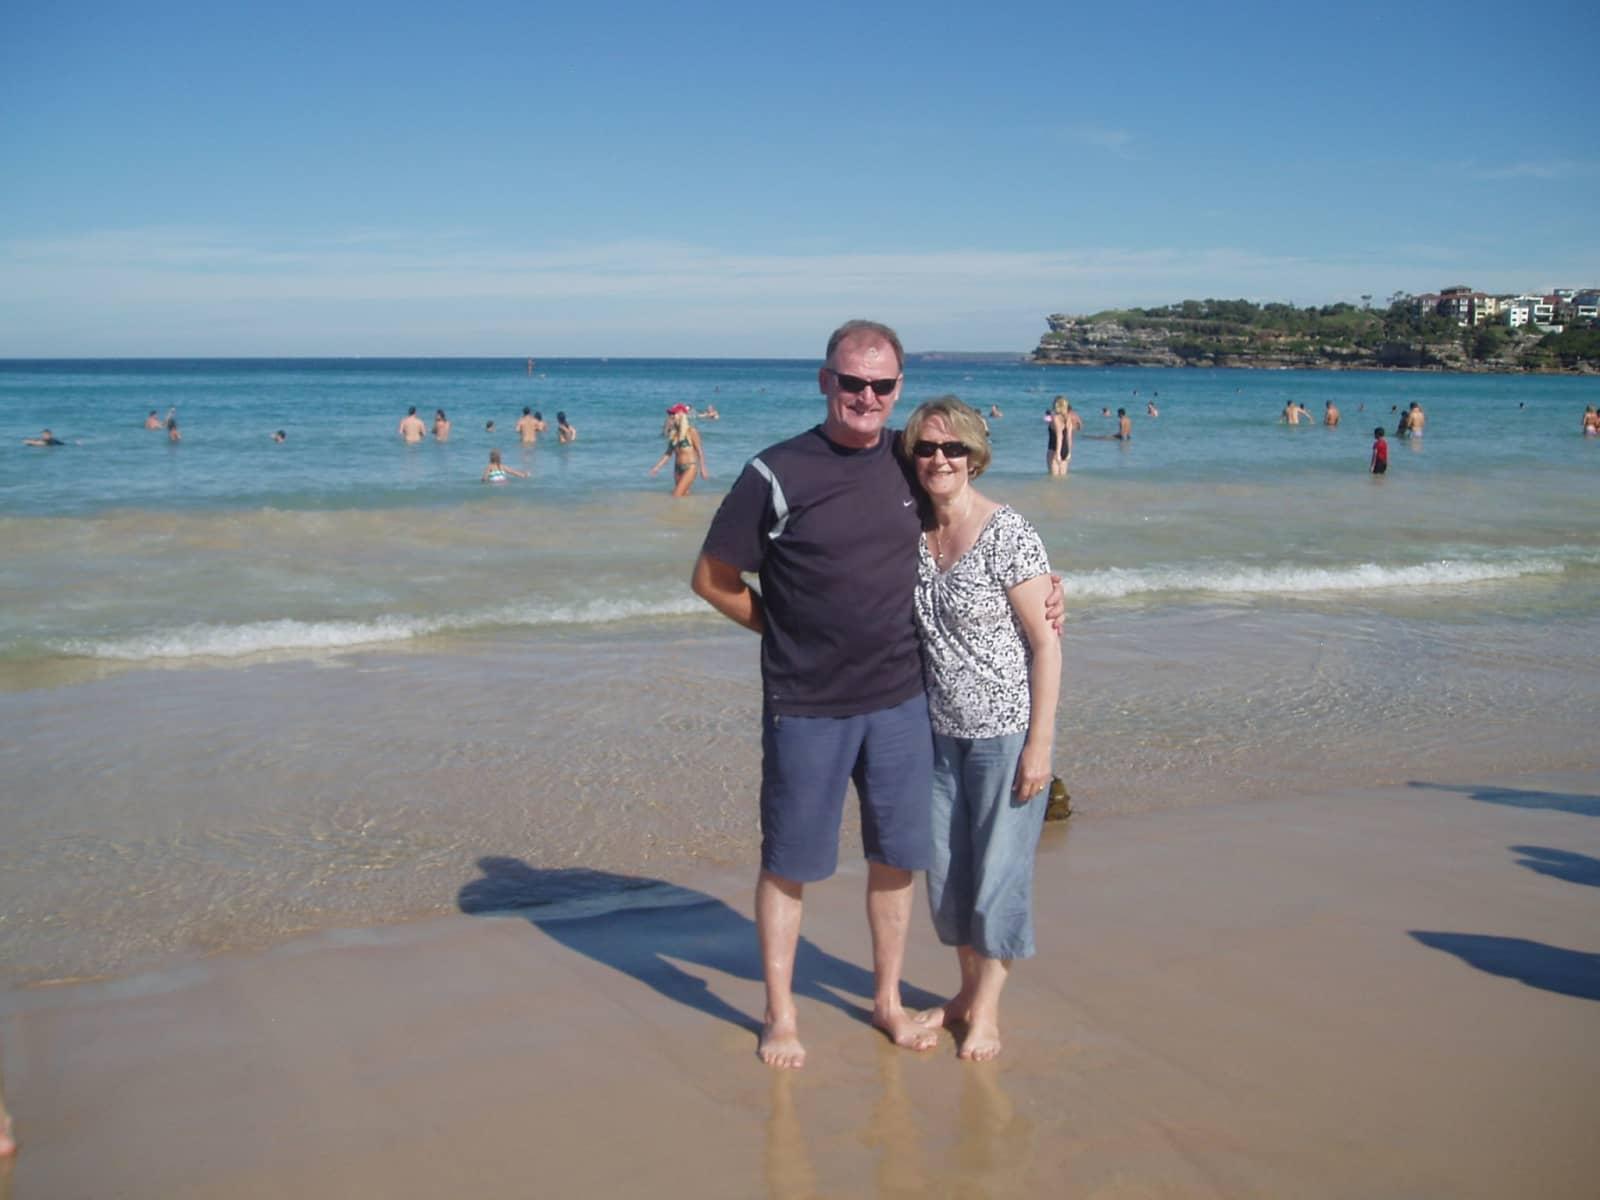 Wendy & Bob from Geelong, Victoria, Australia